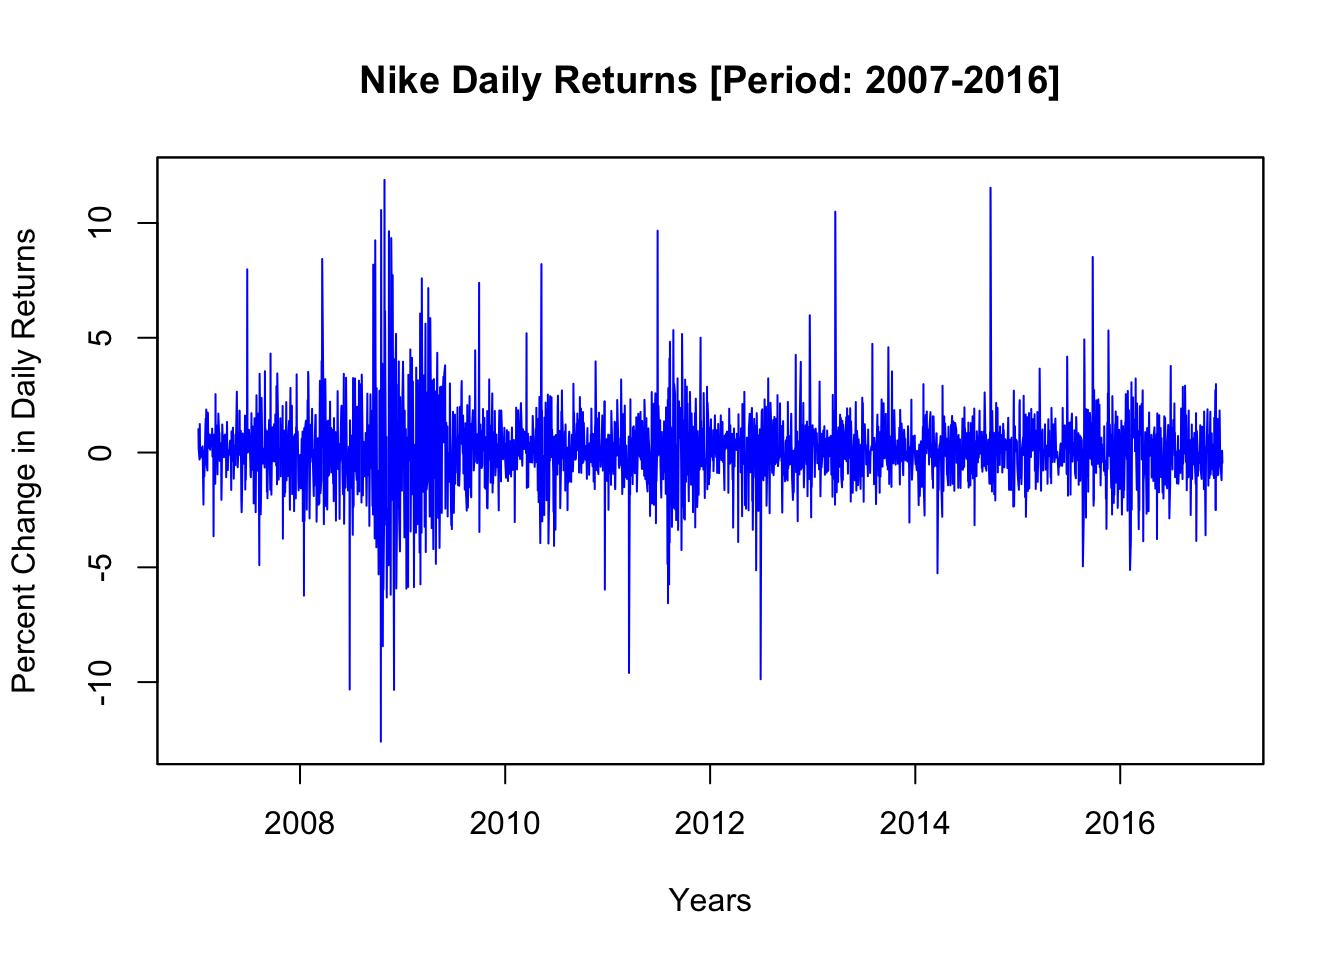 DATA MODELING: Nike Daily Stock Returns [Period: 2007-2016